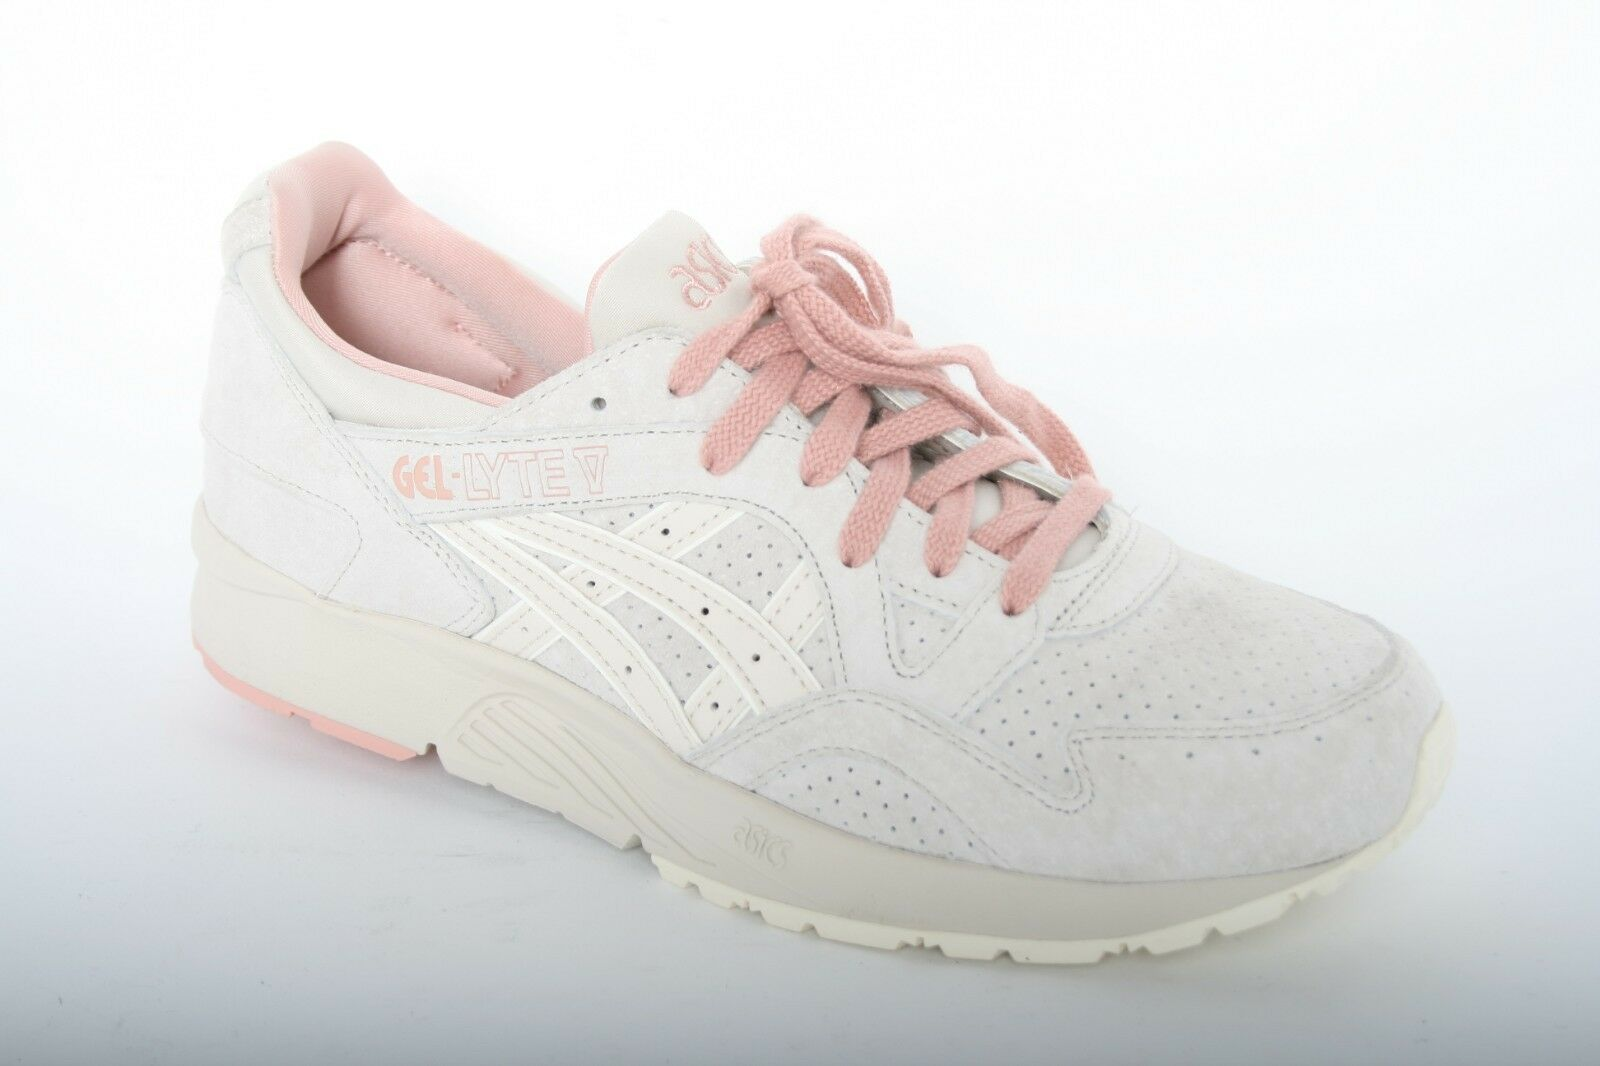 ASICS 'Gel Lyte V' Birch Suede Running shoes Sneakers Women's Sz. 10.5